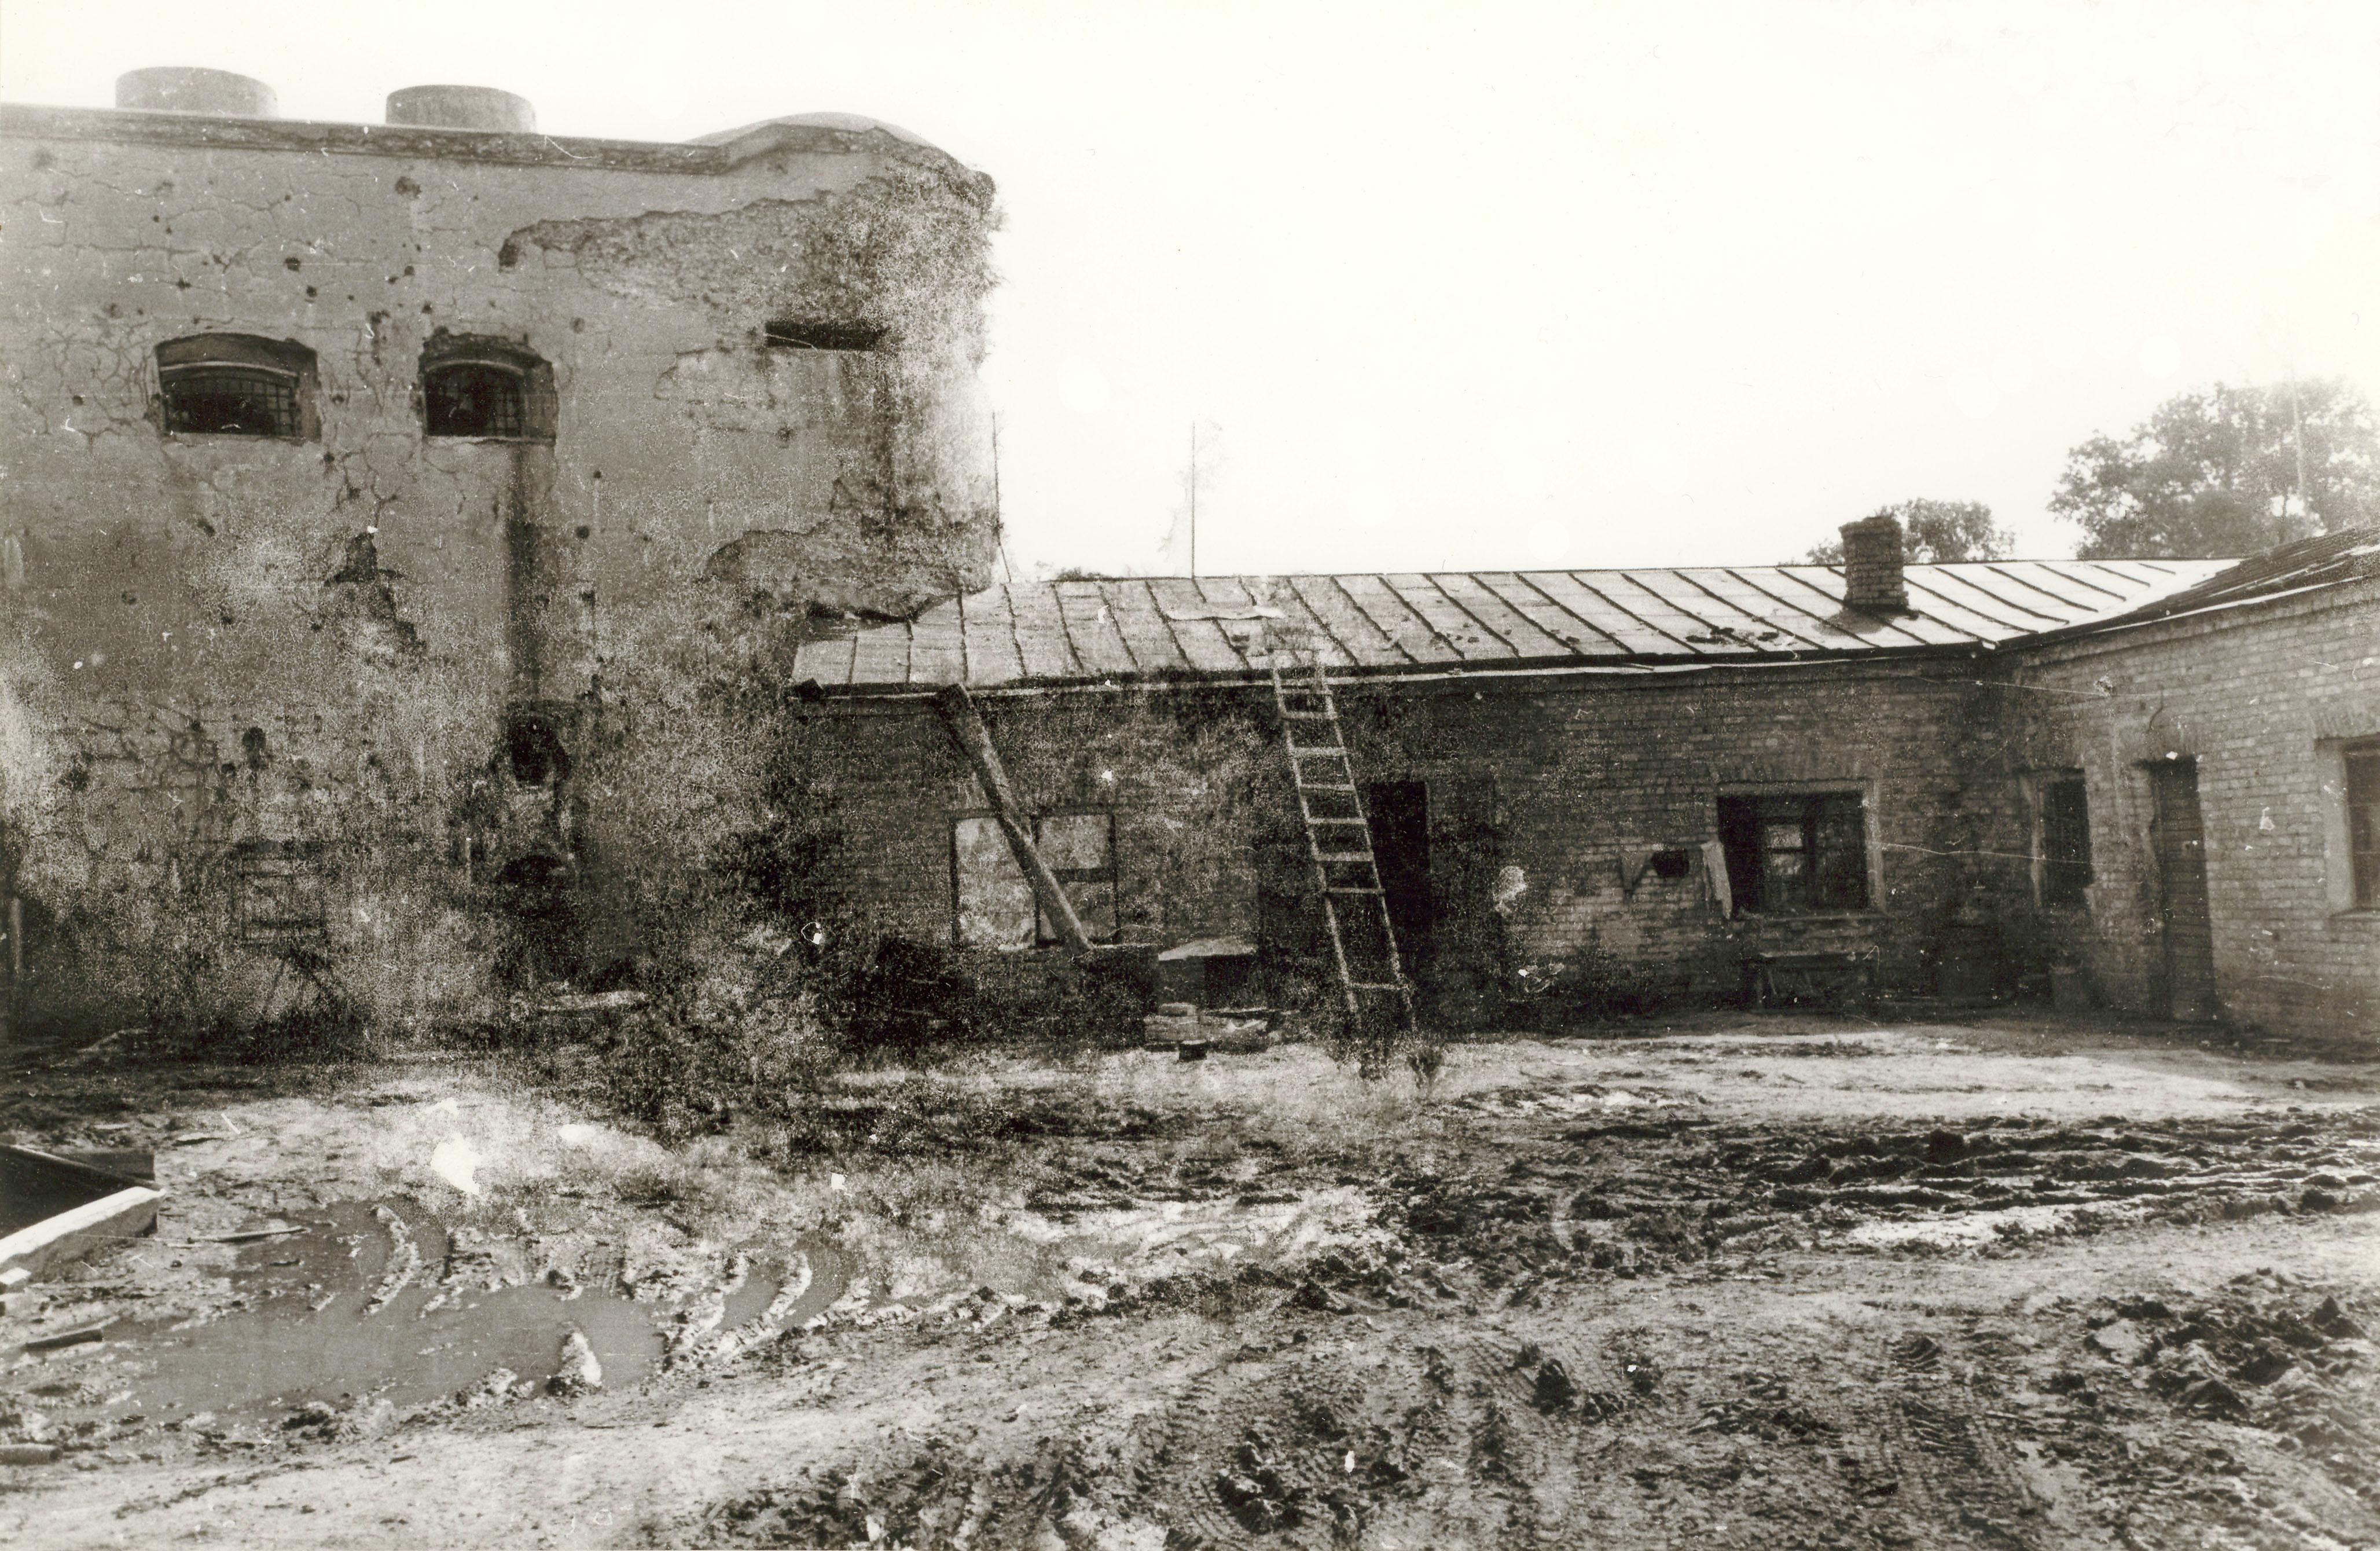 IX-ojo forto būsena 1958 metais